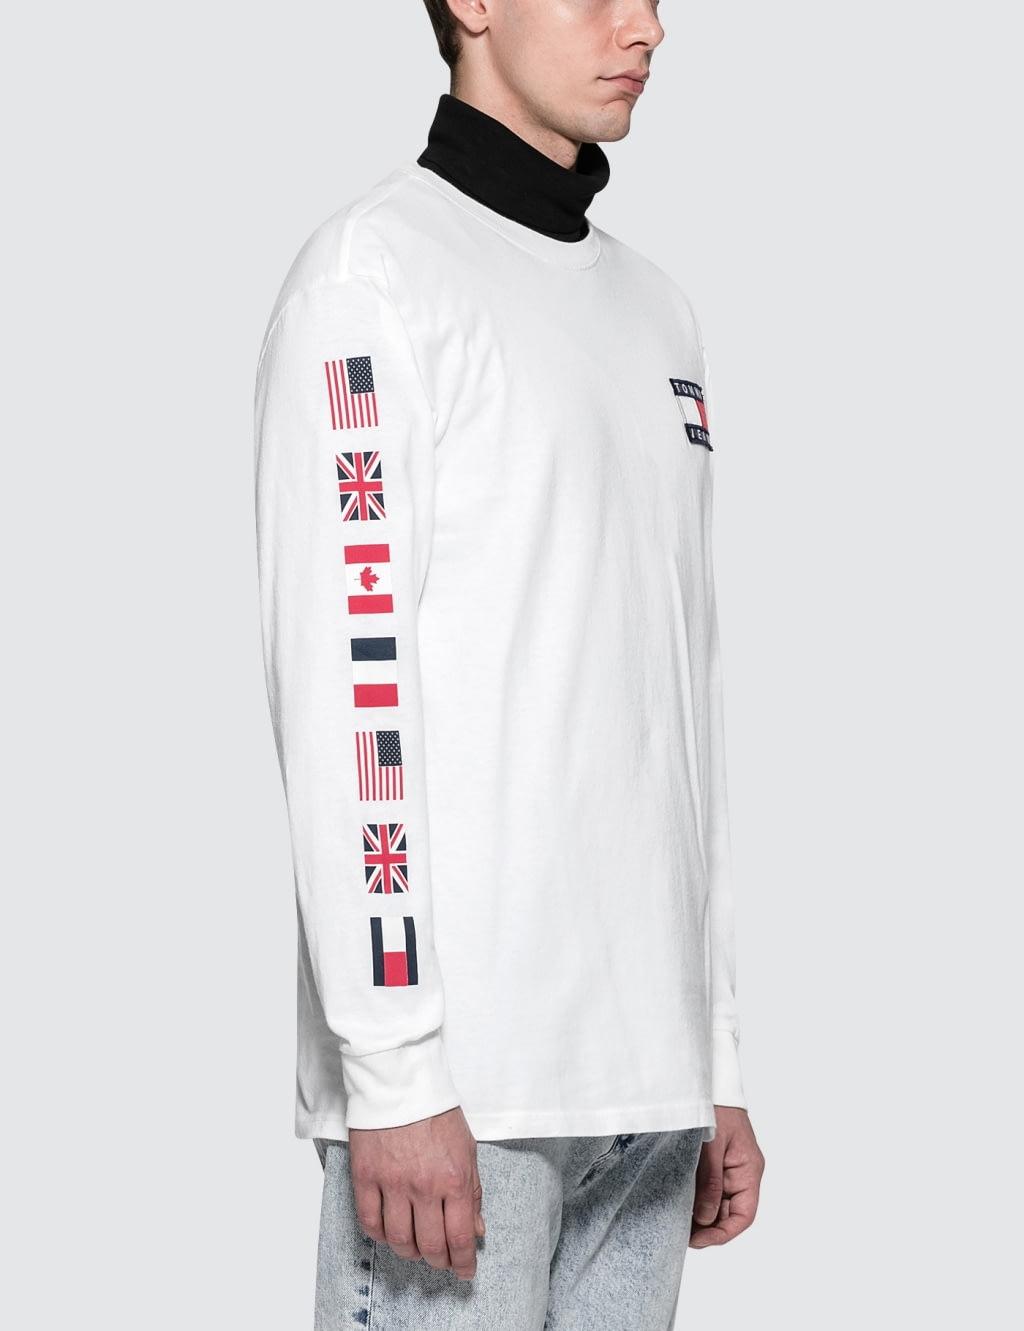 ea11e602 Tommy Jeans 90s Capsule 5.0 Long Sleeve T Shirt With Logo Sleeve ...